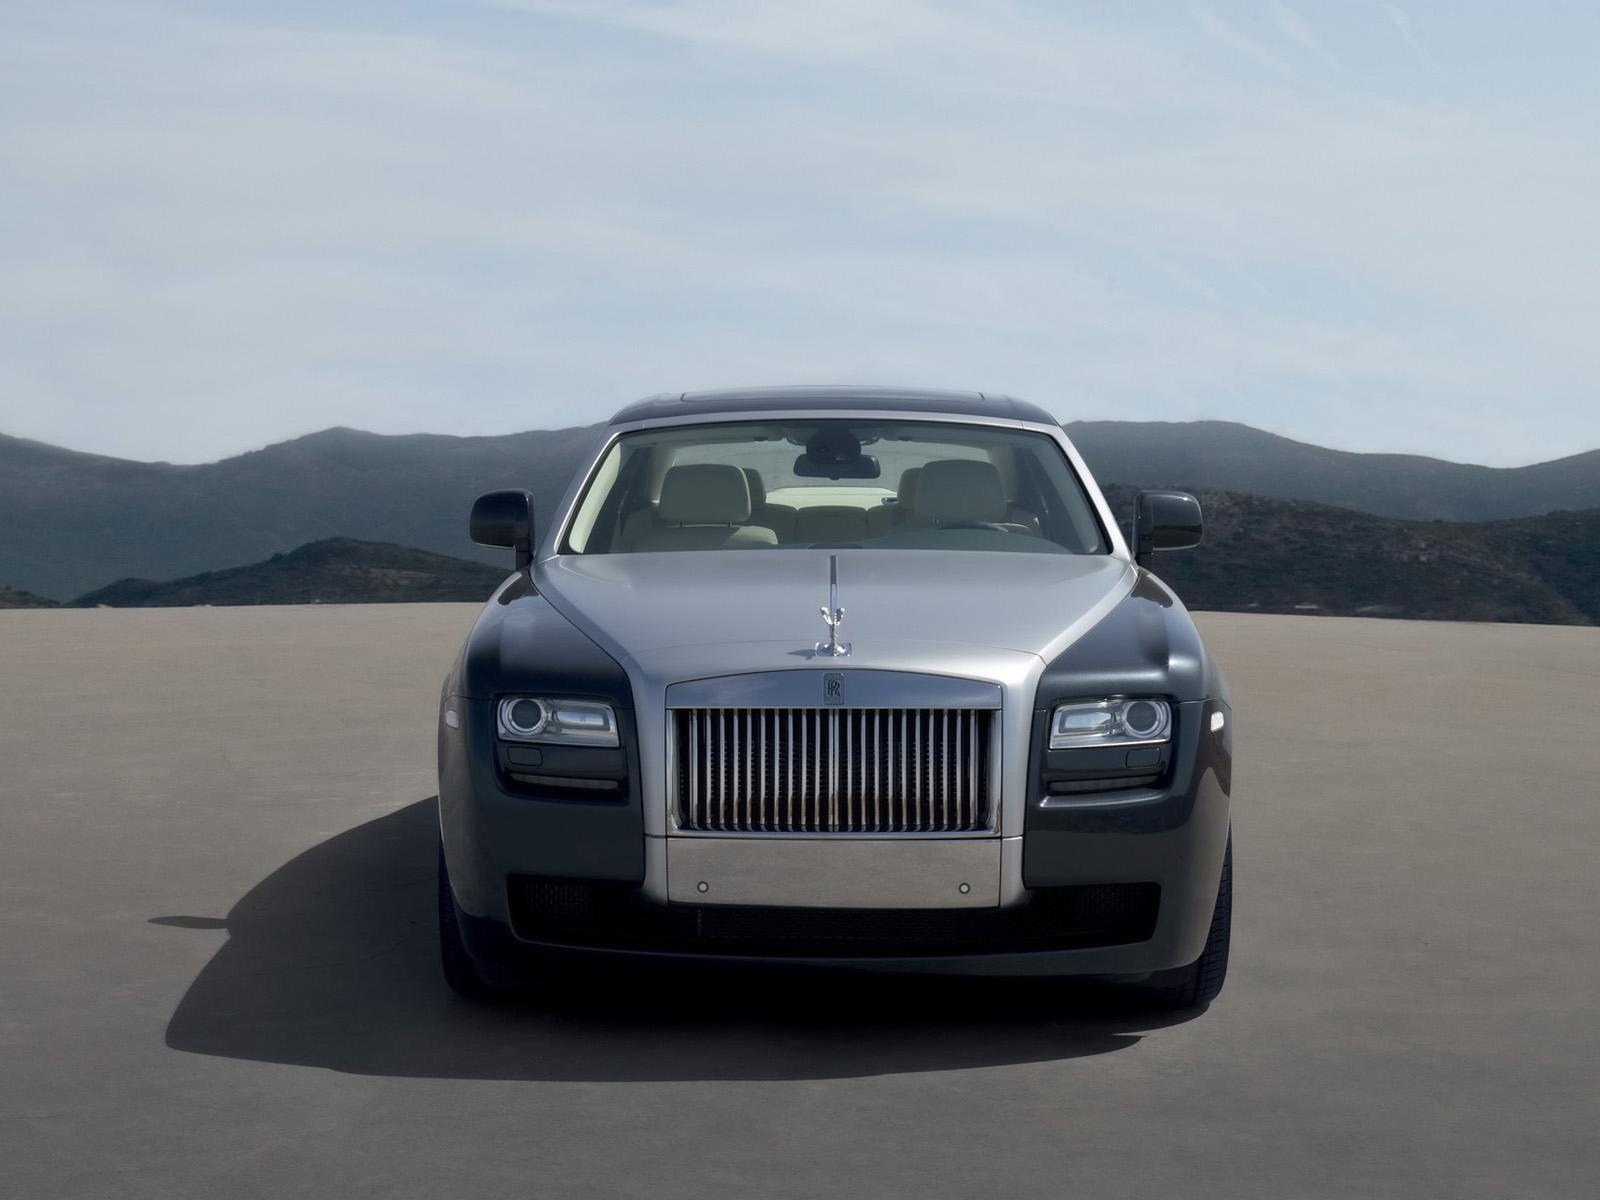 Rolls-Royce Ghost photo #1